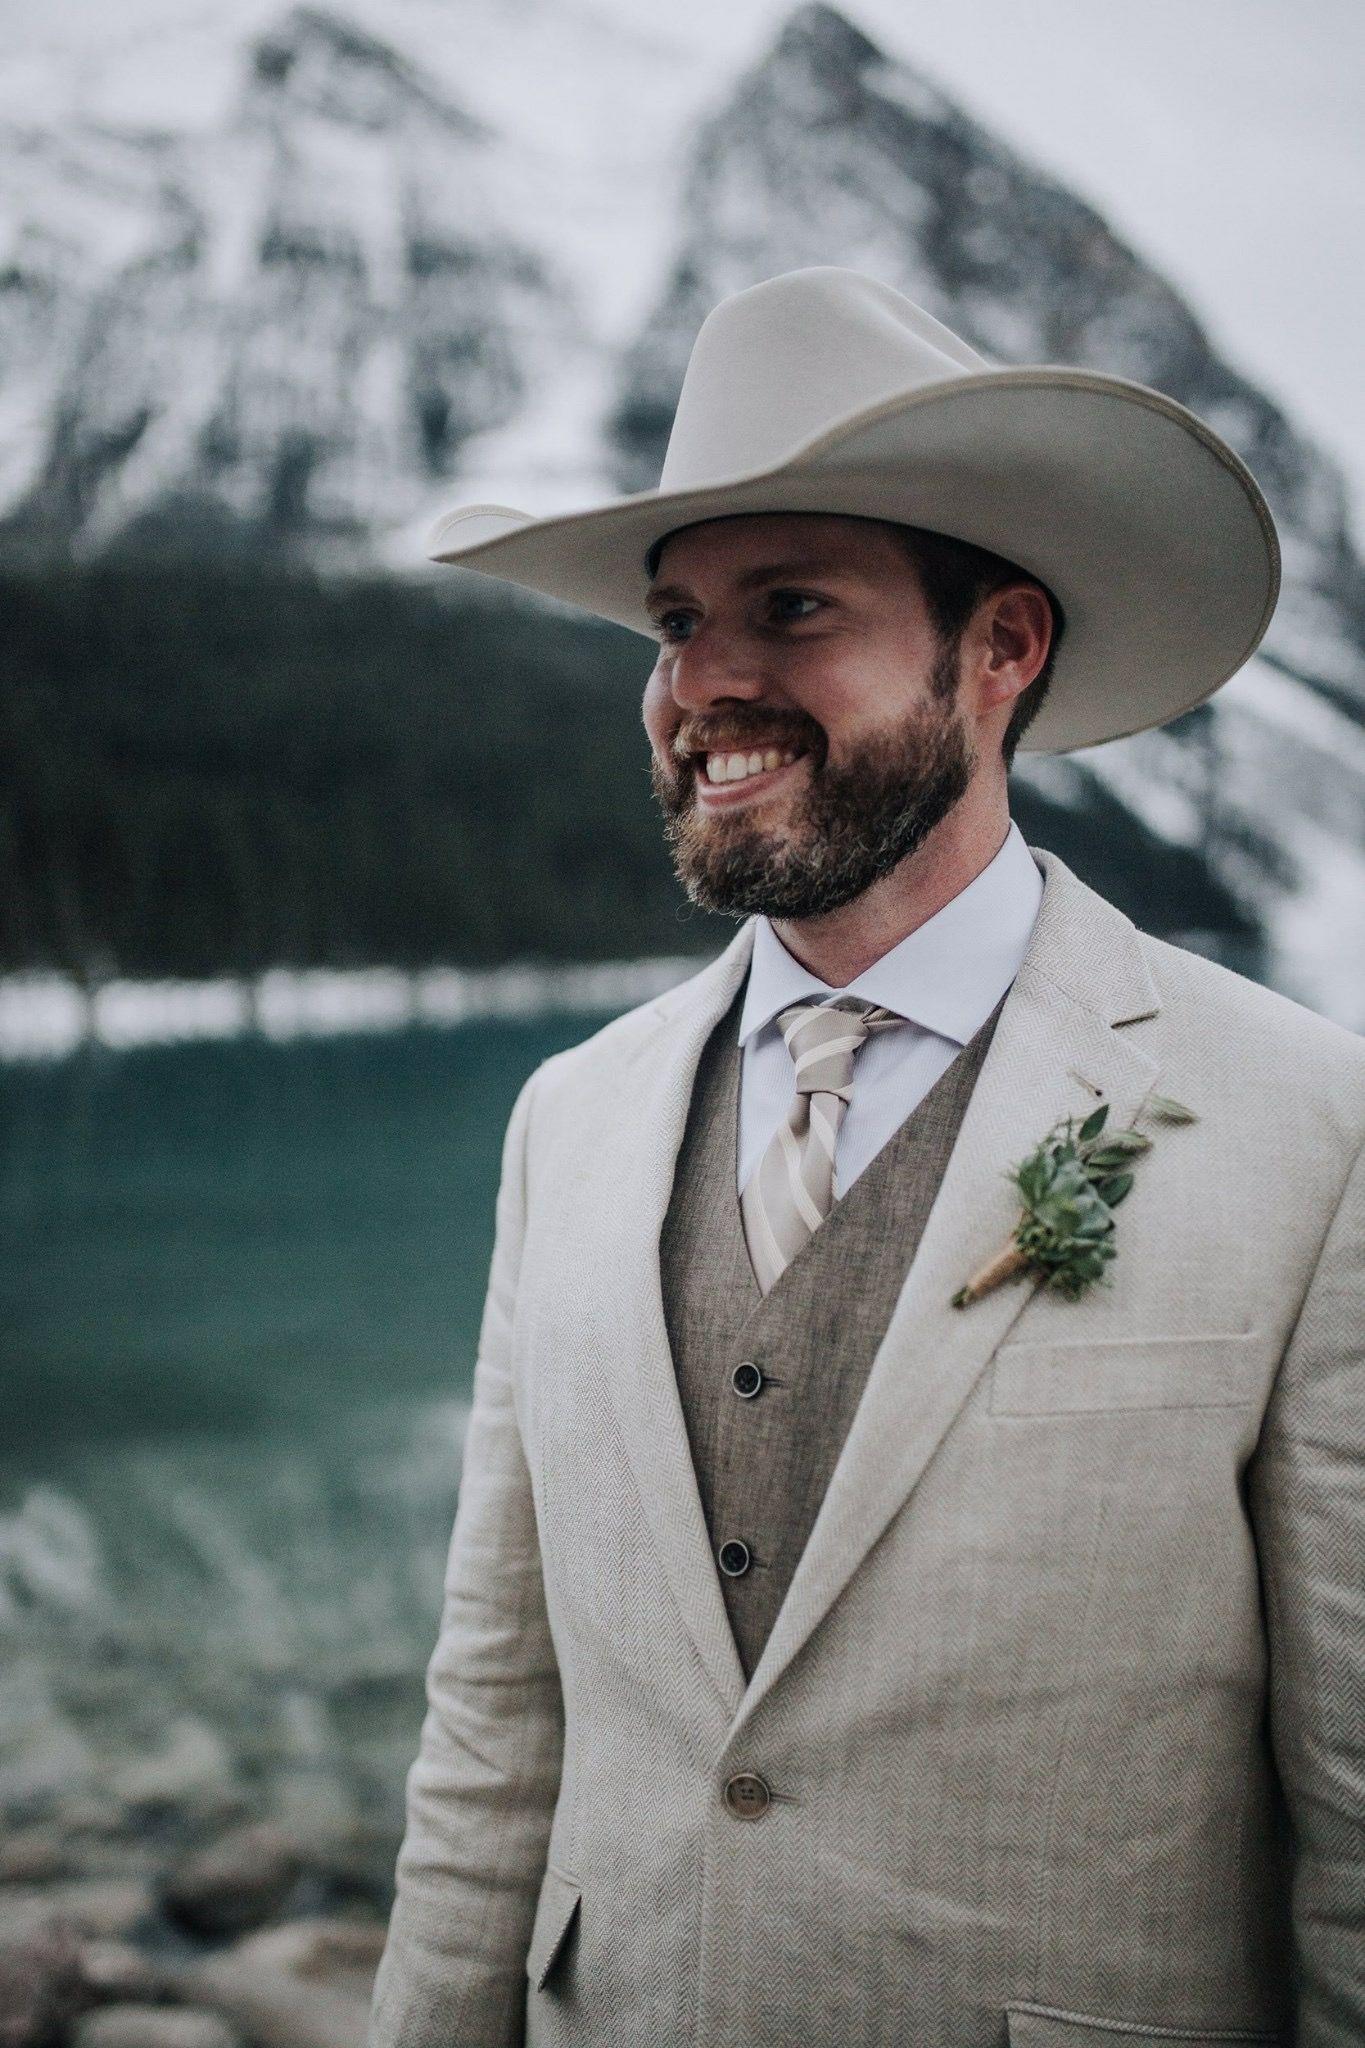 Grooms Attire Winter Wedding Inspiration Cowboy Wedding Inspiration Cowboy Wedding Attire Groom Wedding Attire Groom Attire